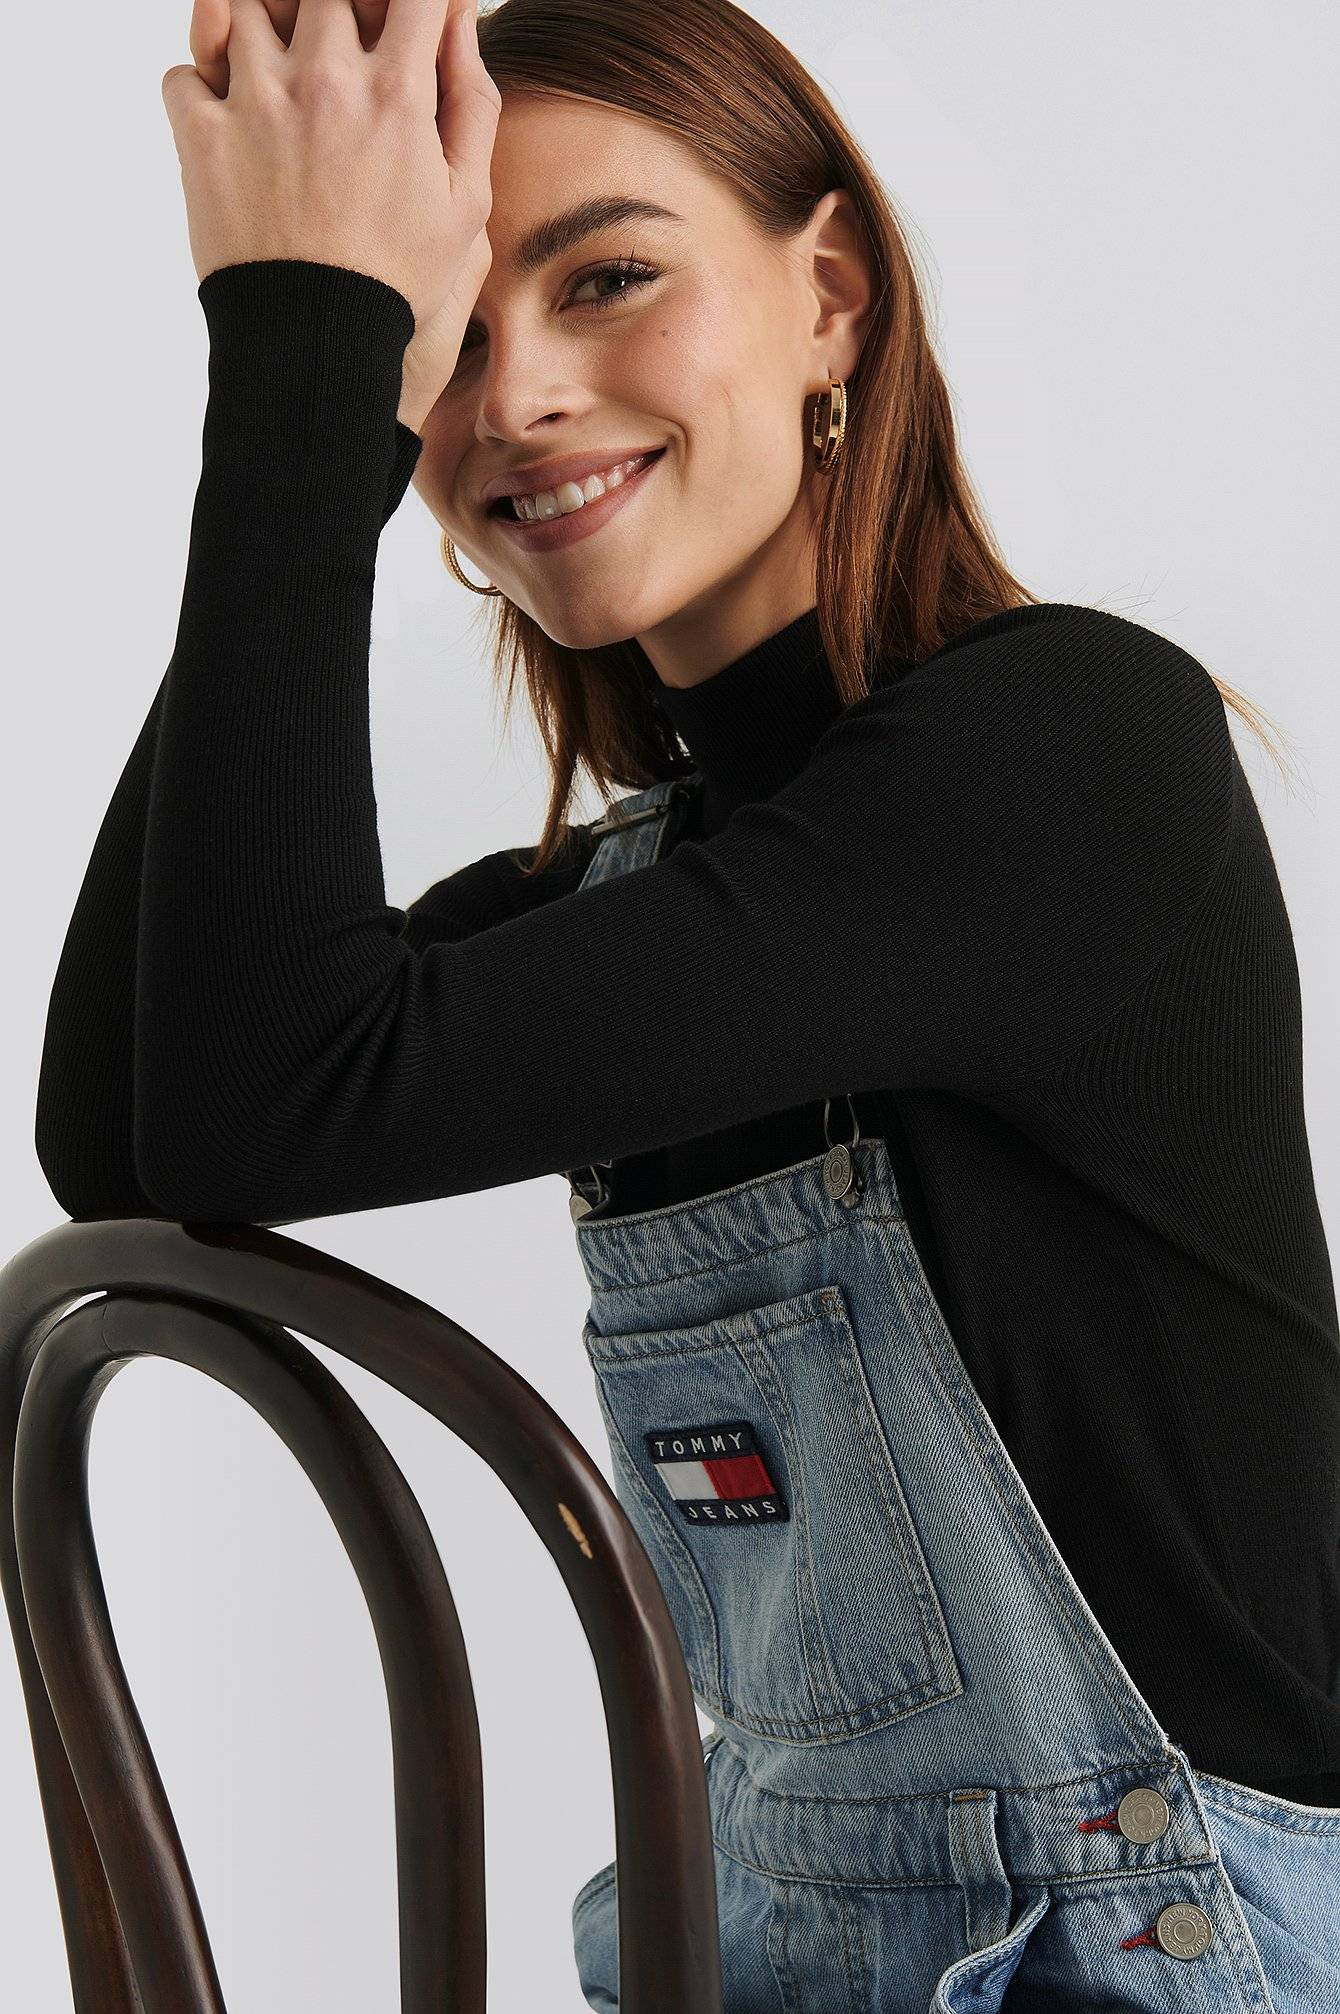 Tommy Jeans New Dungaree Denim 90S Light - Blue  - Size: W24 L30,W25 L30,W26 L30,W27 L30,W28 L30,W29 L30,W